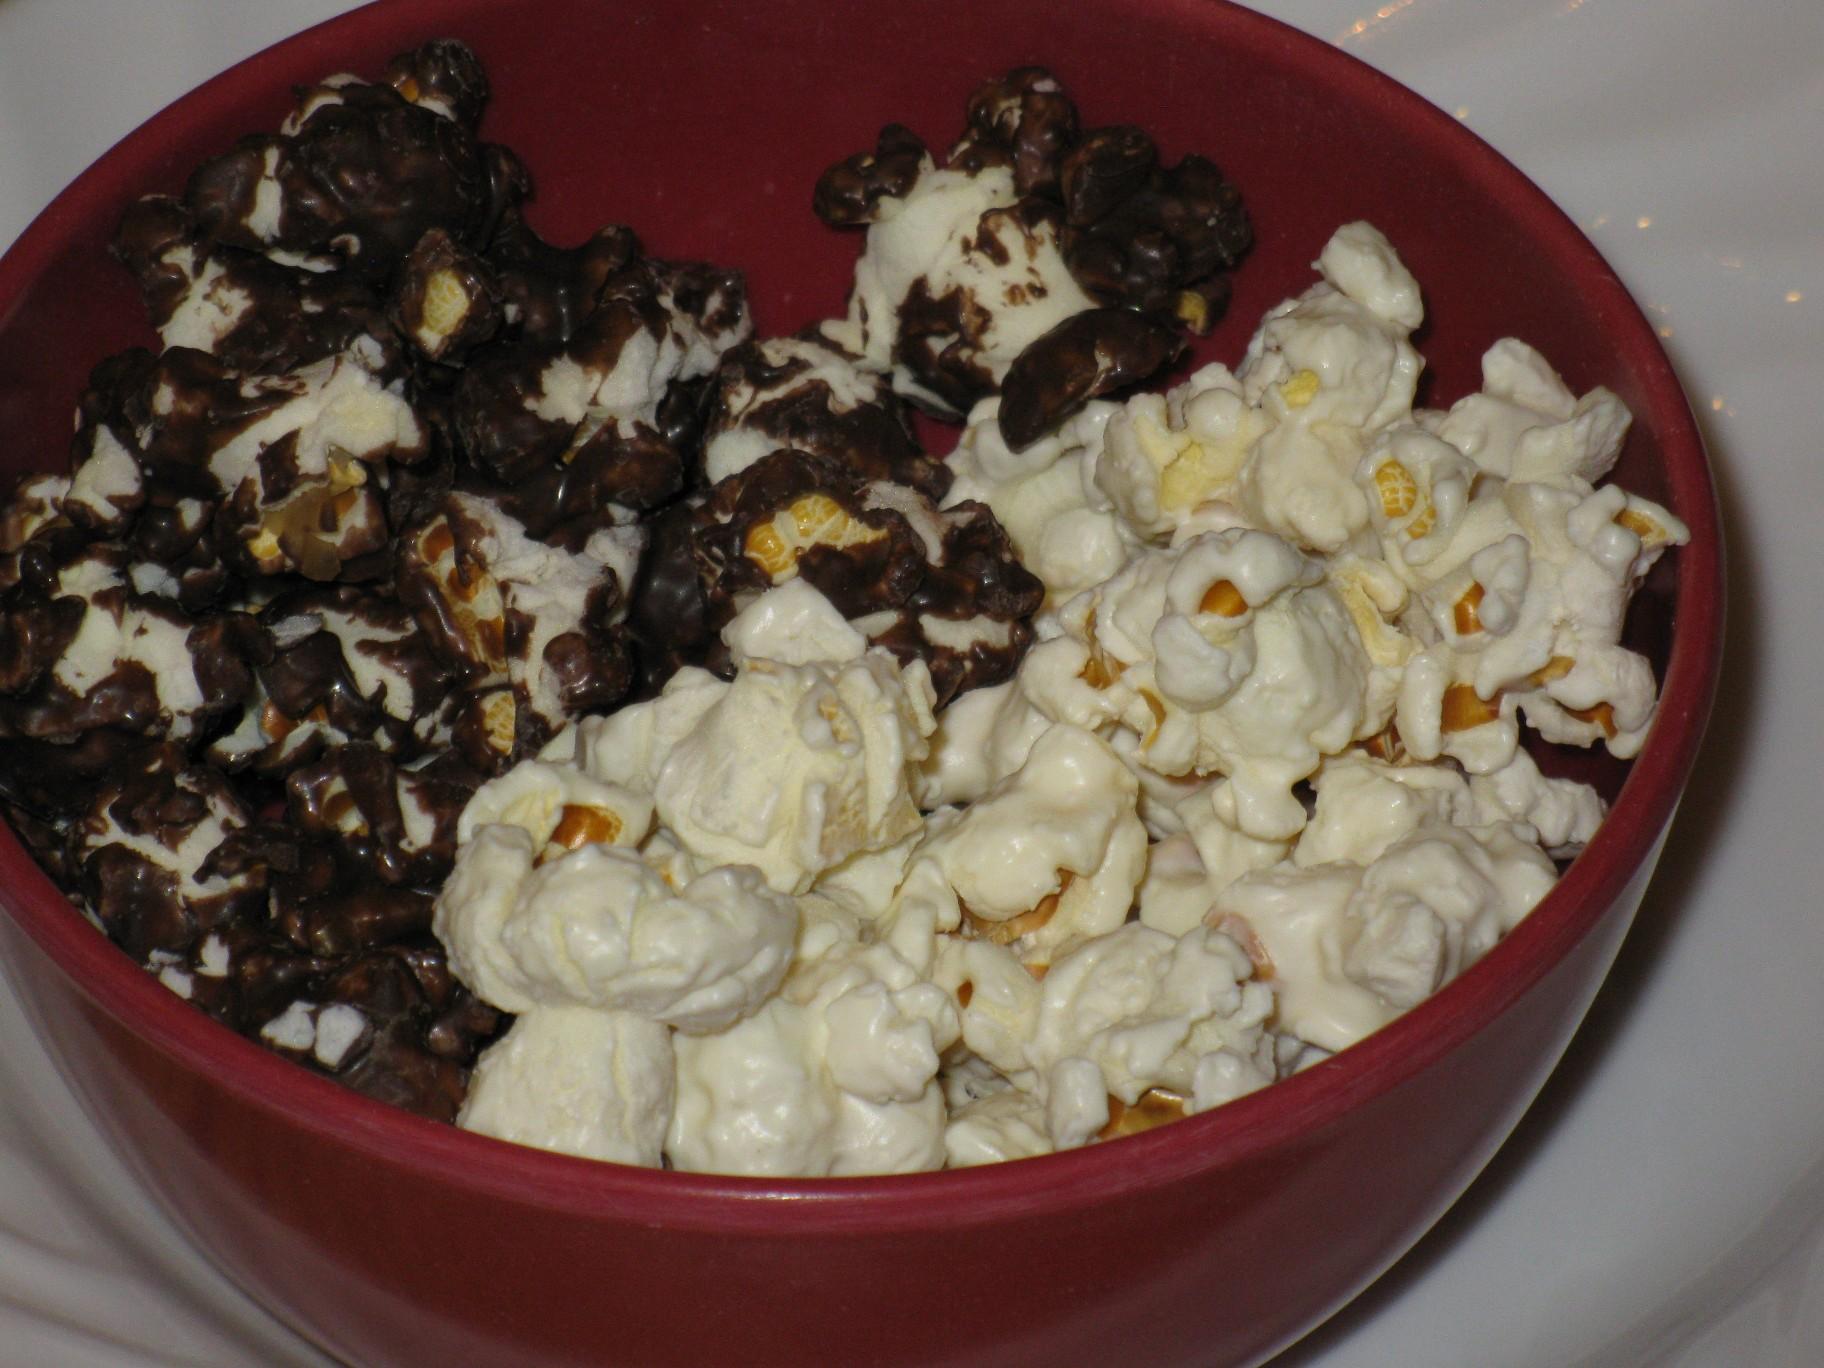 Reindeer or snowman poop tasty kitchen a happy recipe community forumfinder Choice Image